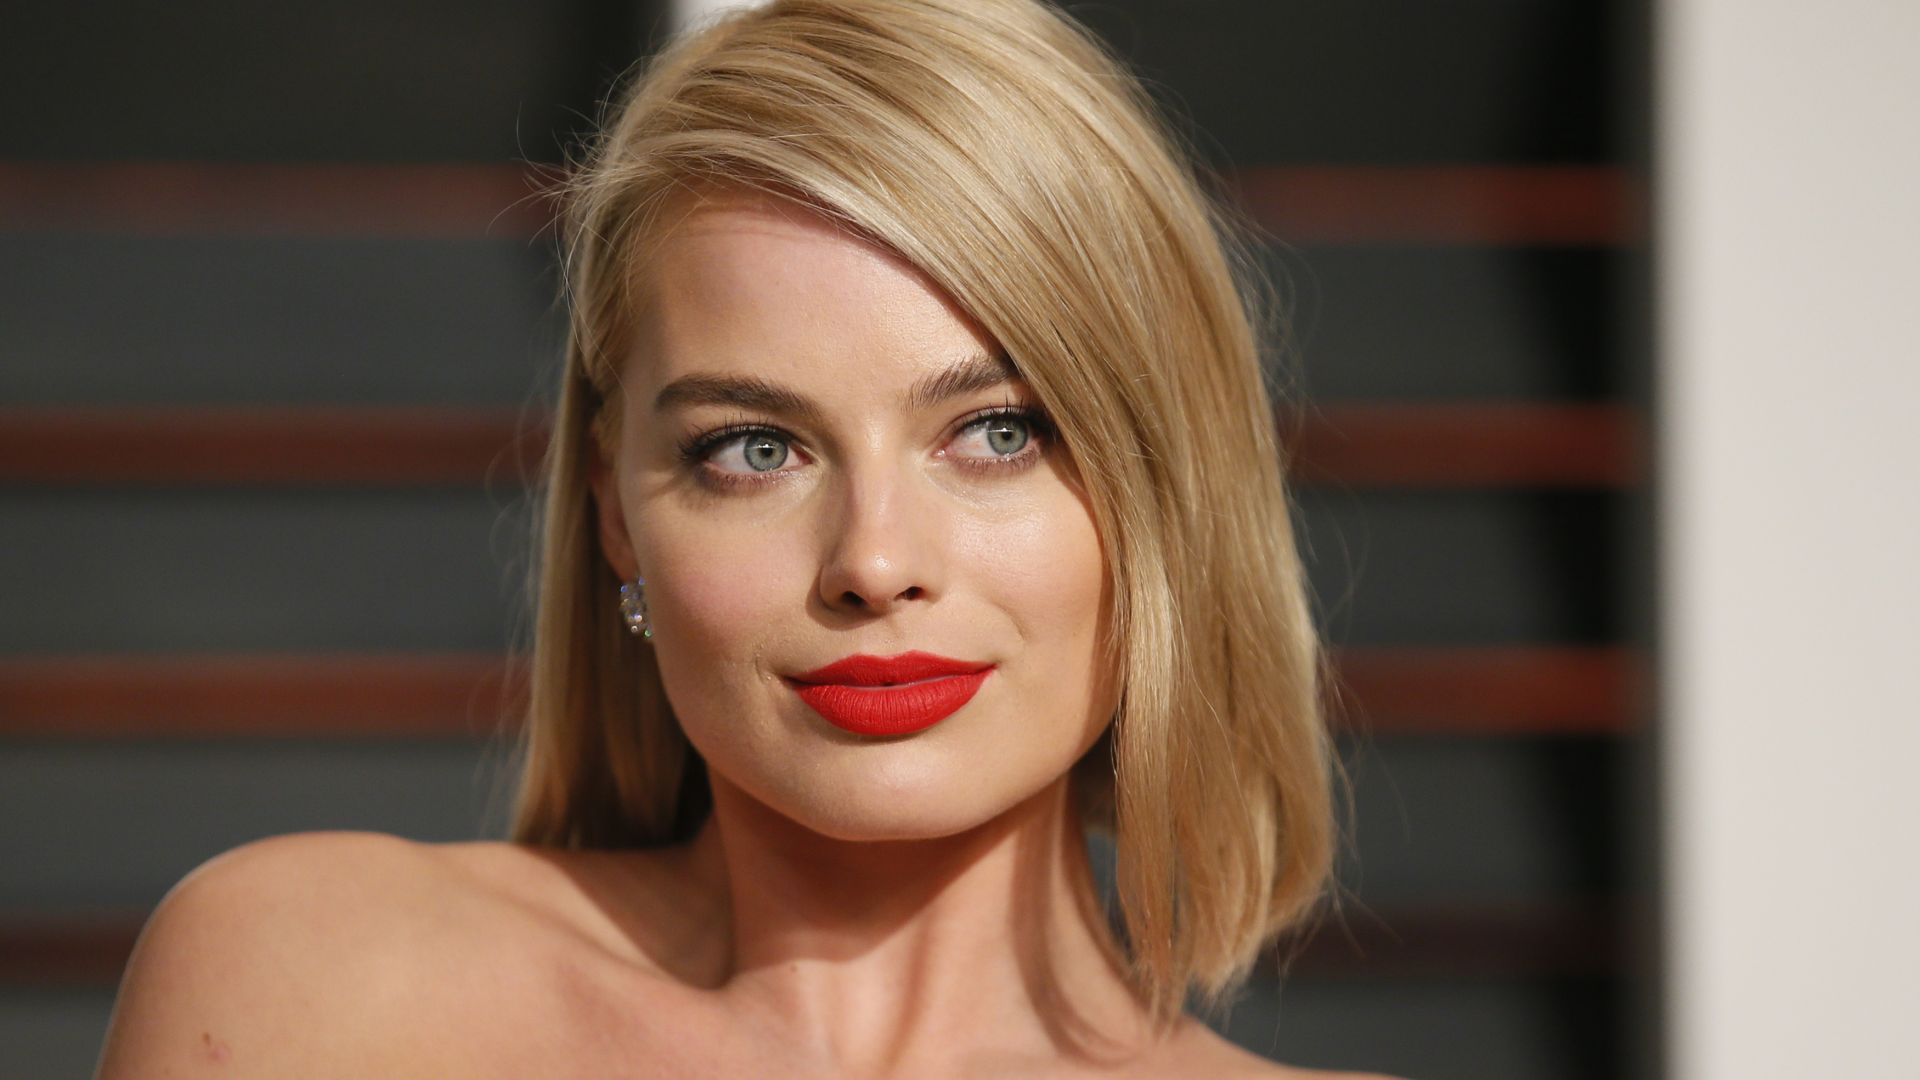 Fondos de pantalla Margot Robbie en alfombra roja